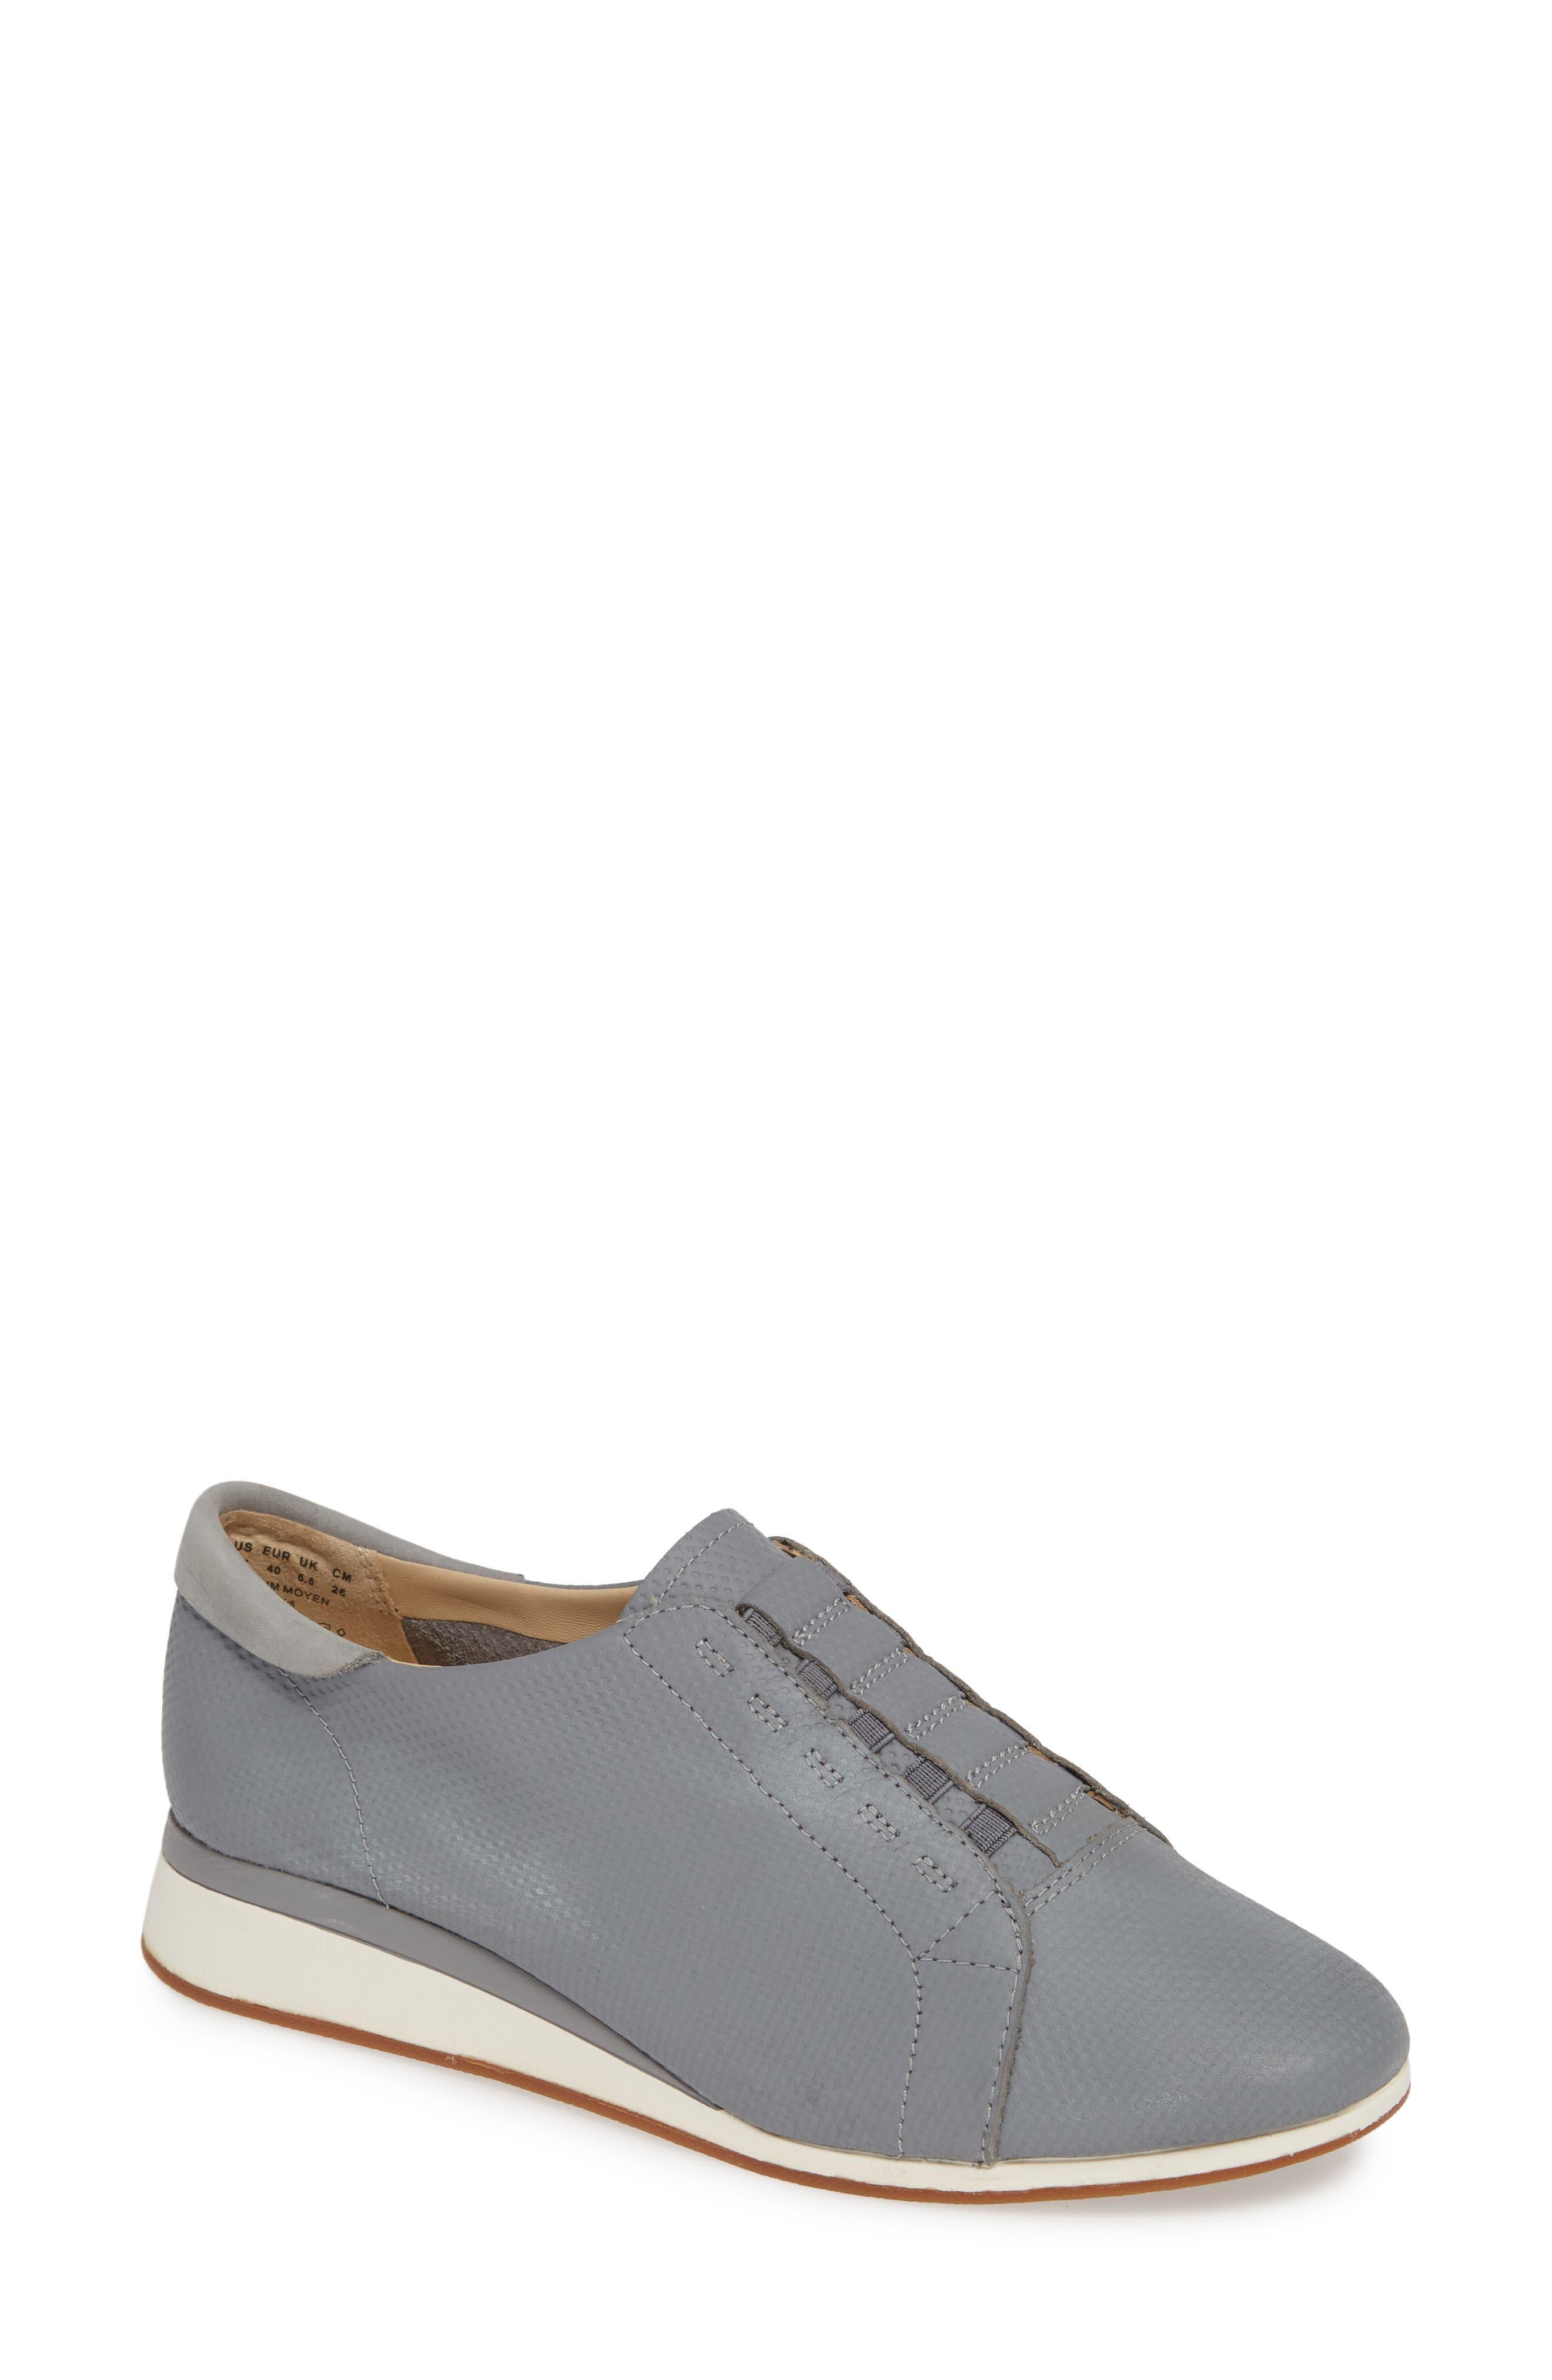 Hush Puppies Evaro Slip-On Sneaker, Grey